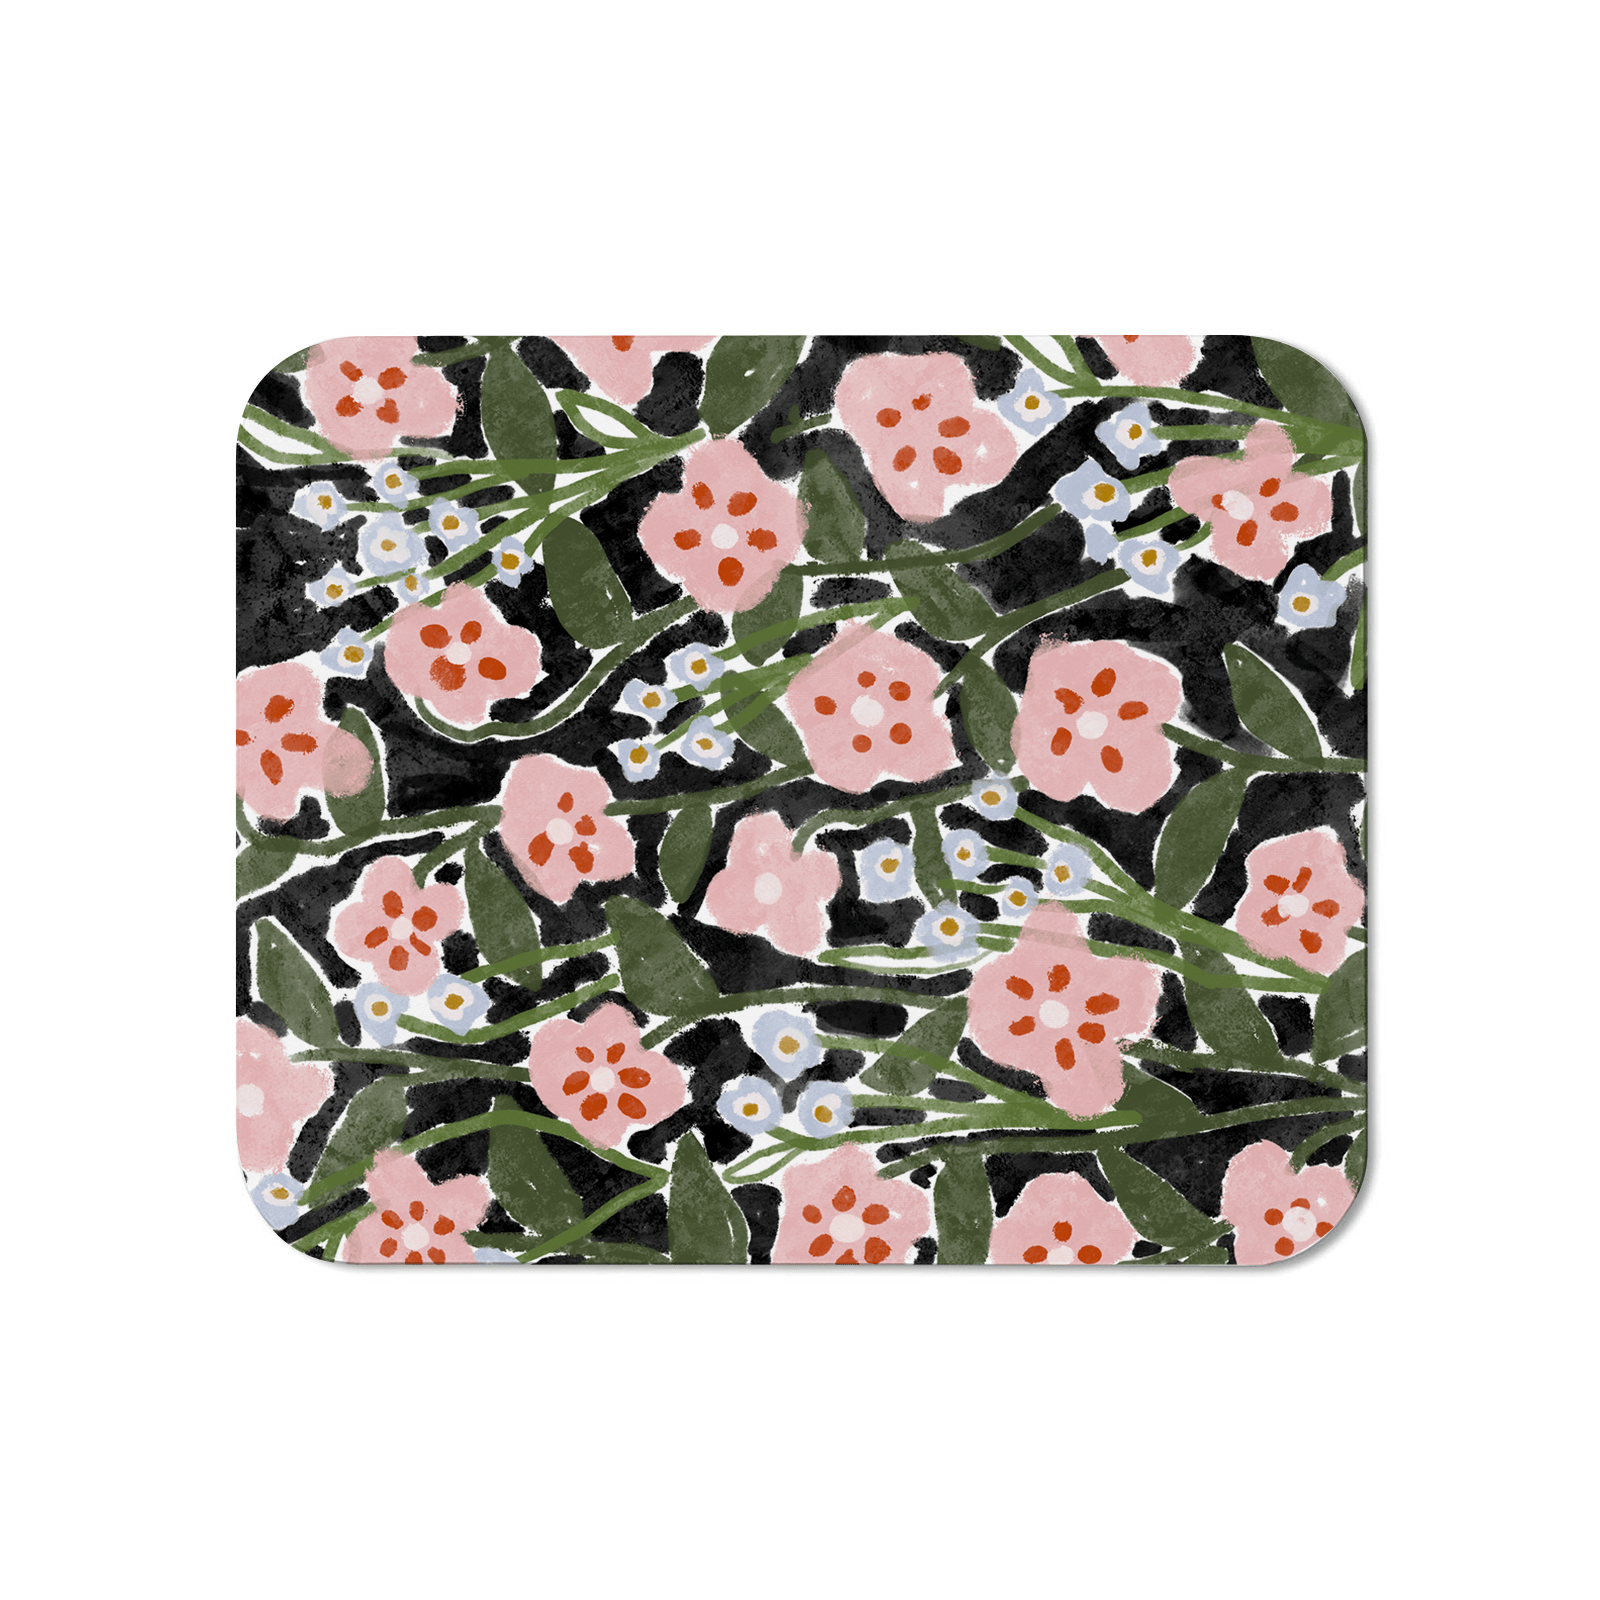 Mousepad Blossom